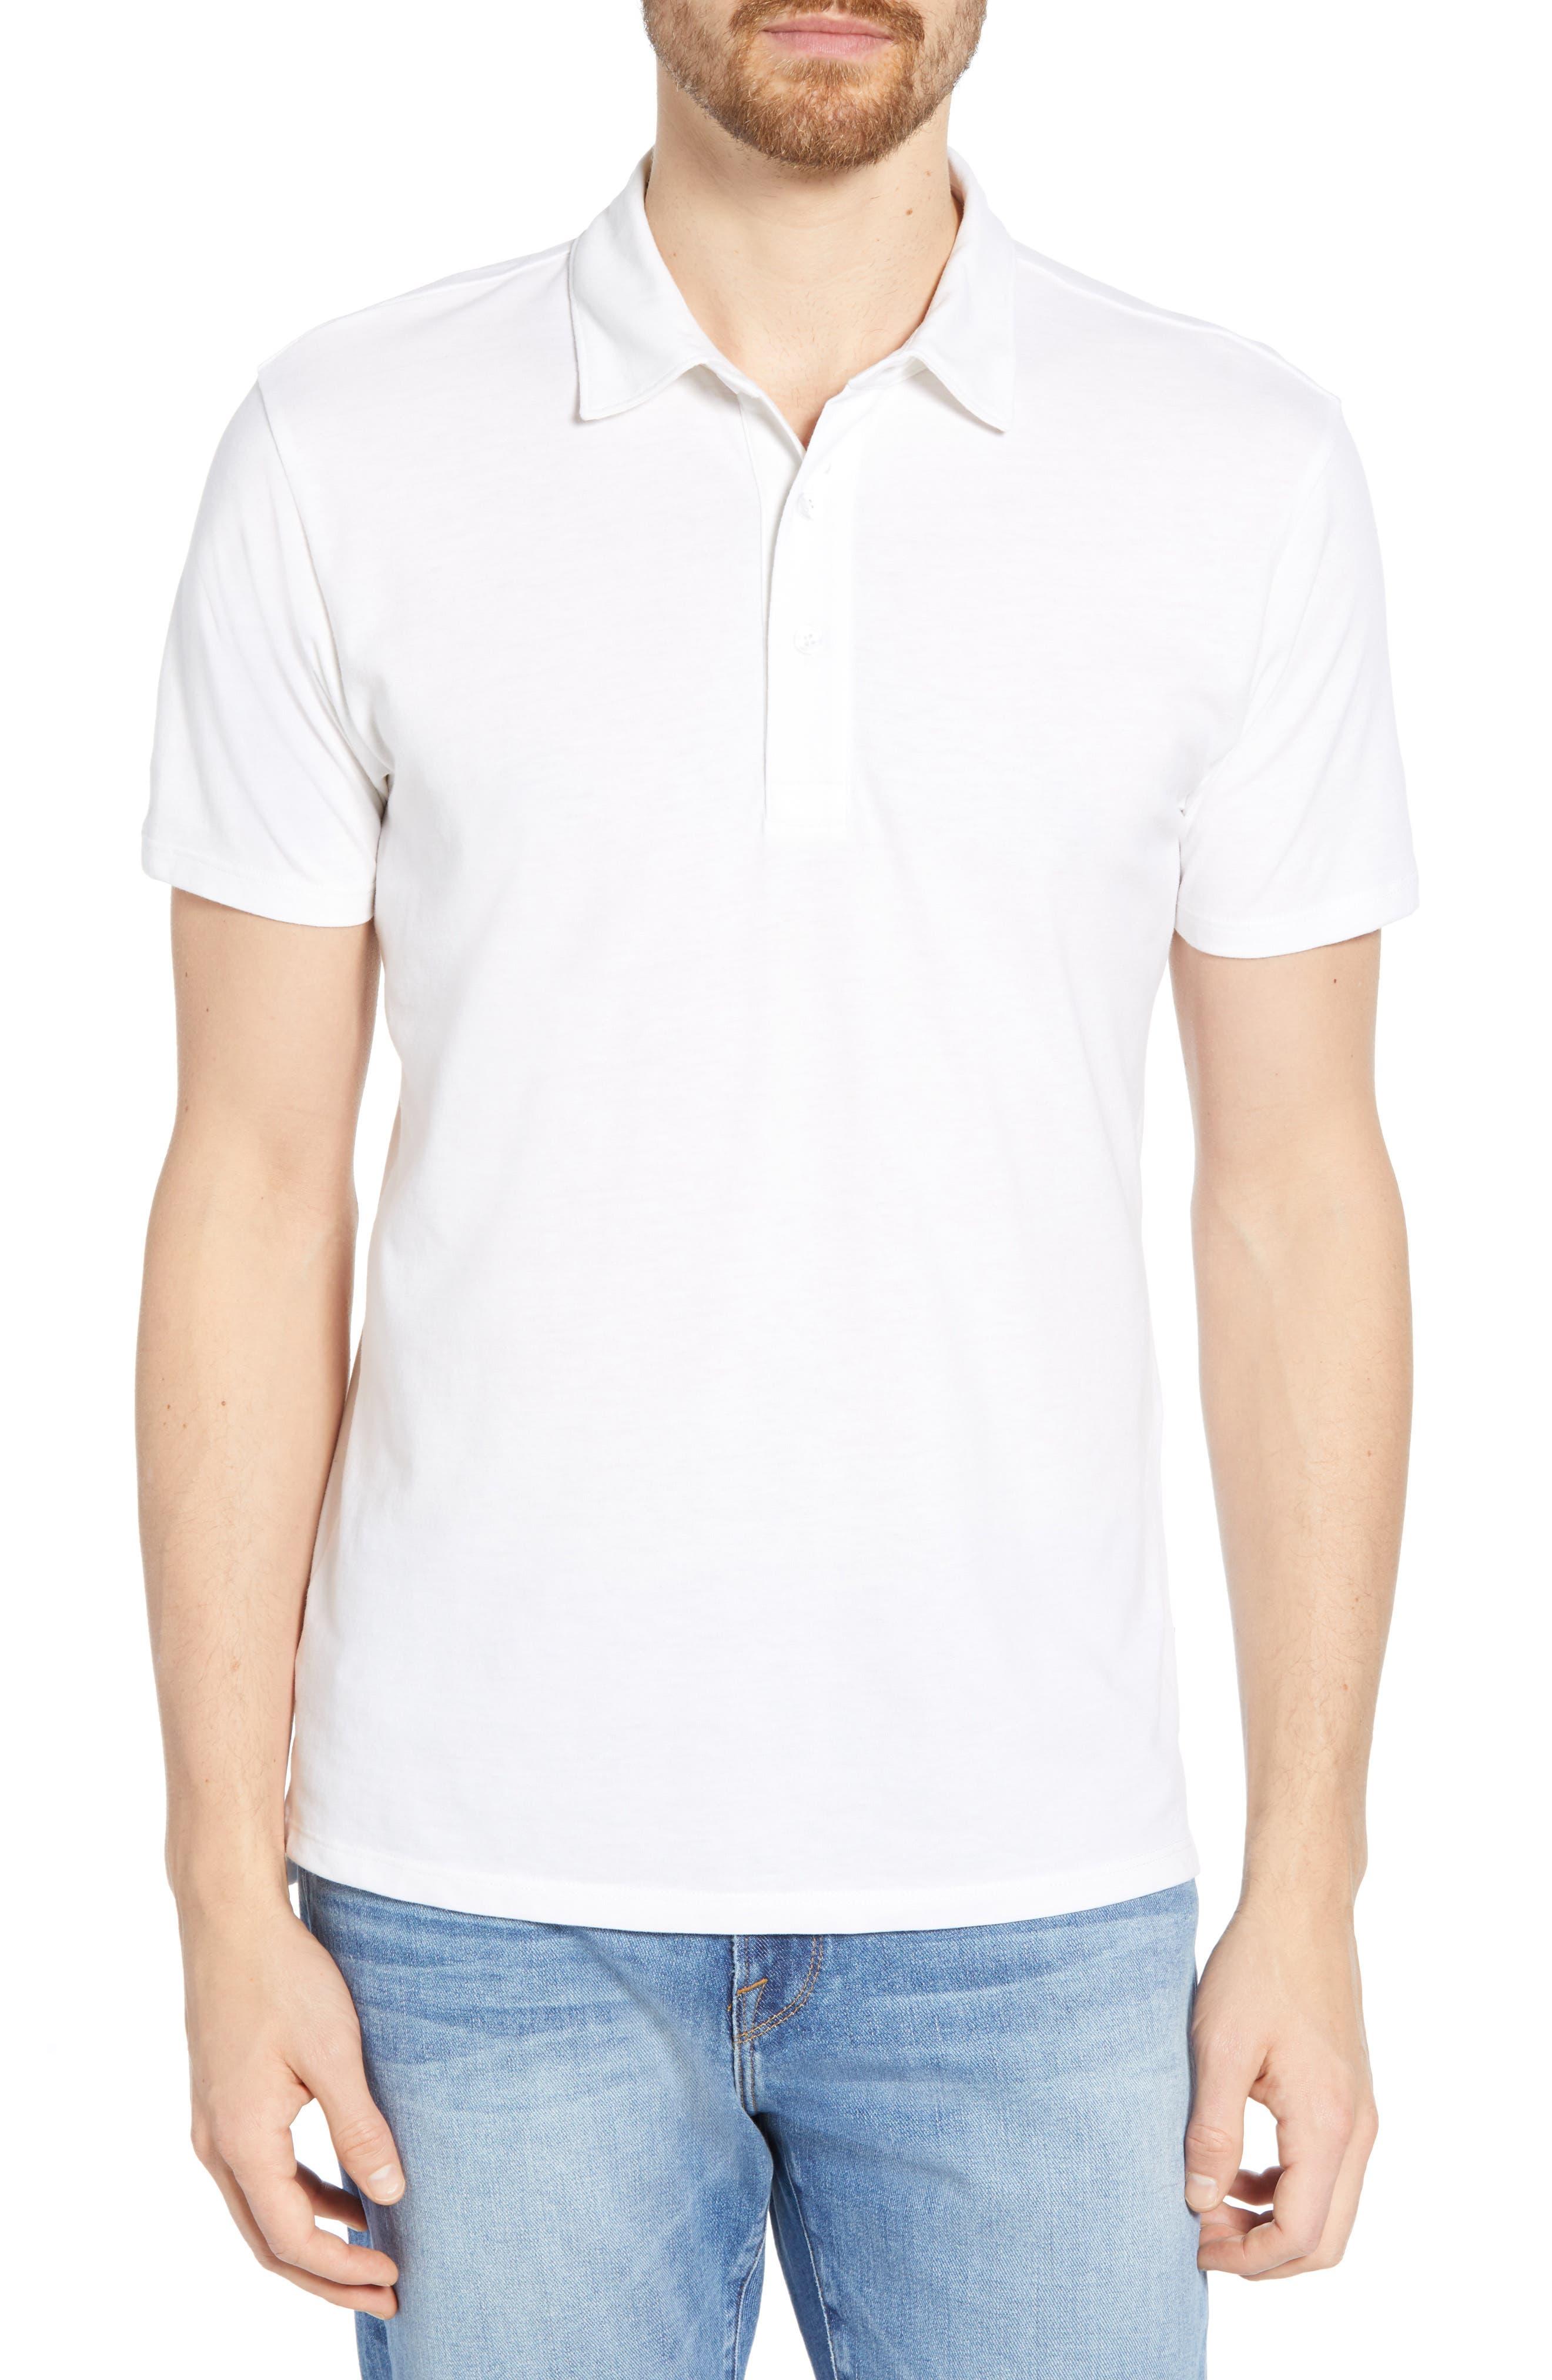 BONOBOS Slim Fit Performance Polo, Main, color, BRIGHT WHITE